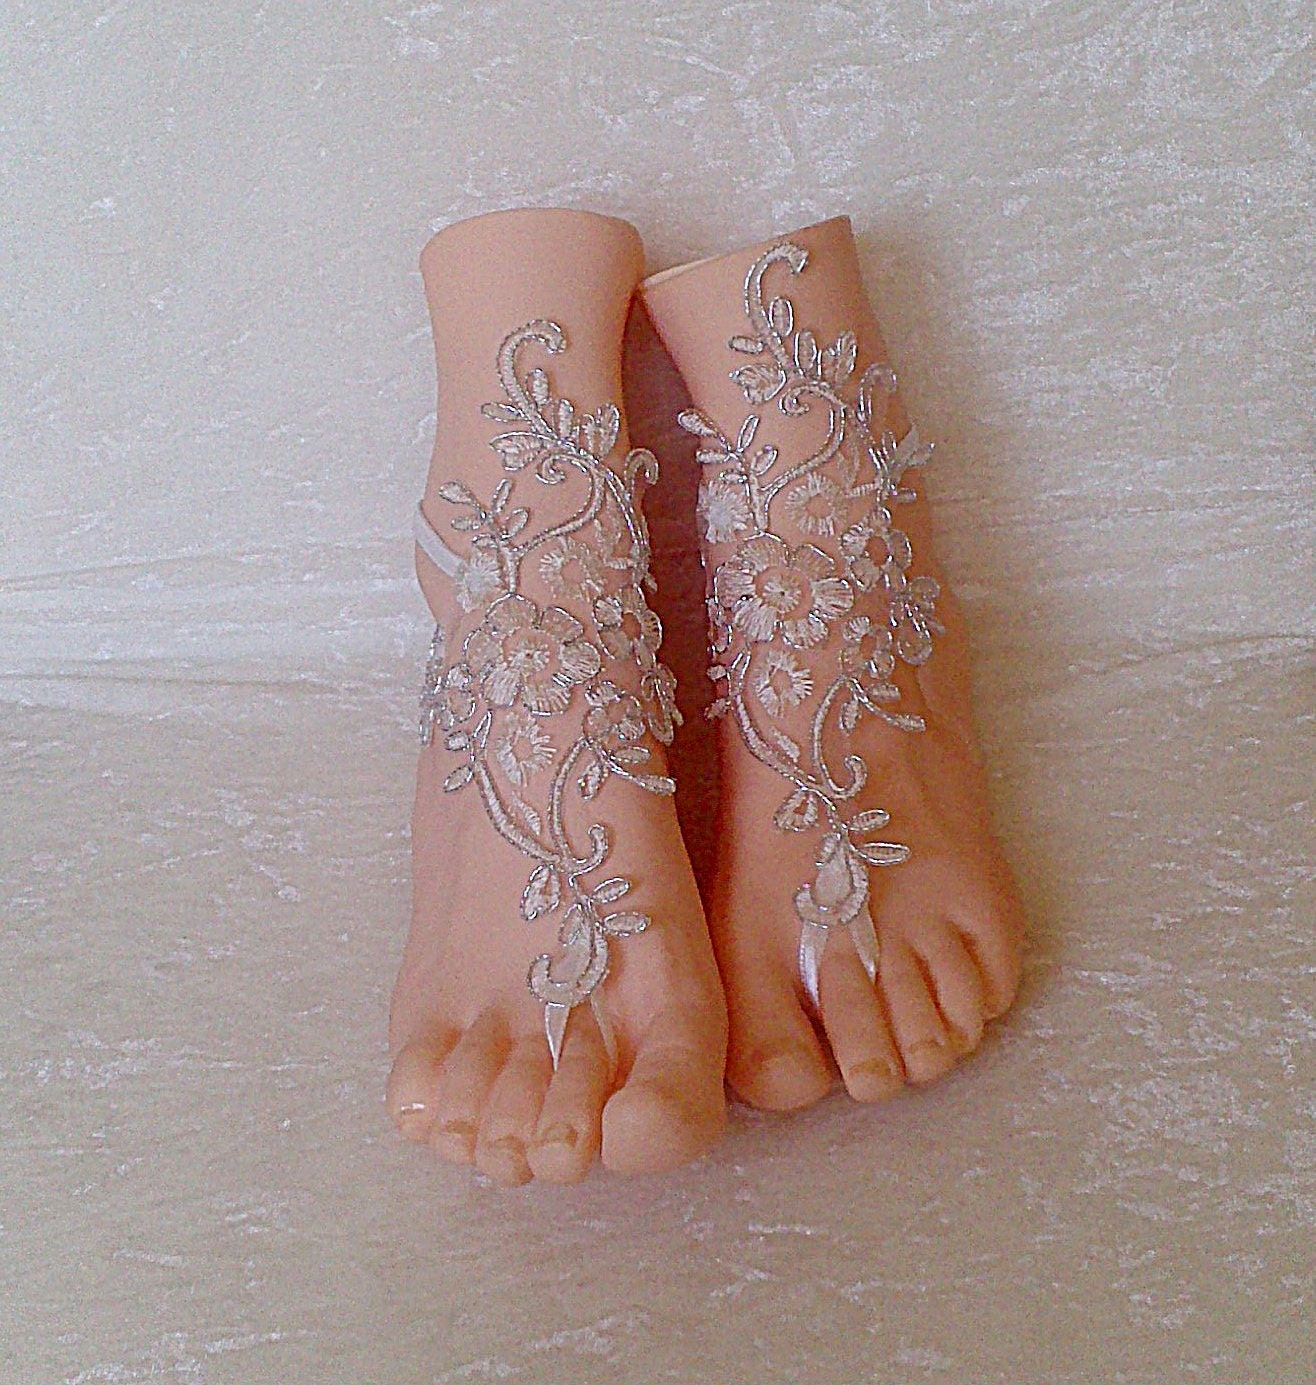 c970a9f3ba1f00 Free ship ivory silver cord wedding barefoot sandles wedding prom party  steampunk bangle beach anklets bangles. GlovesByJana